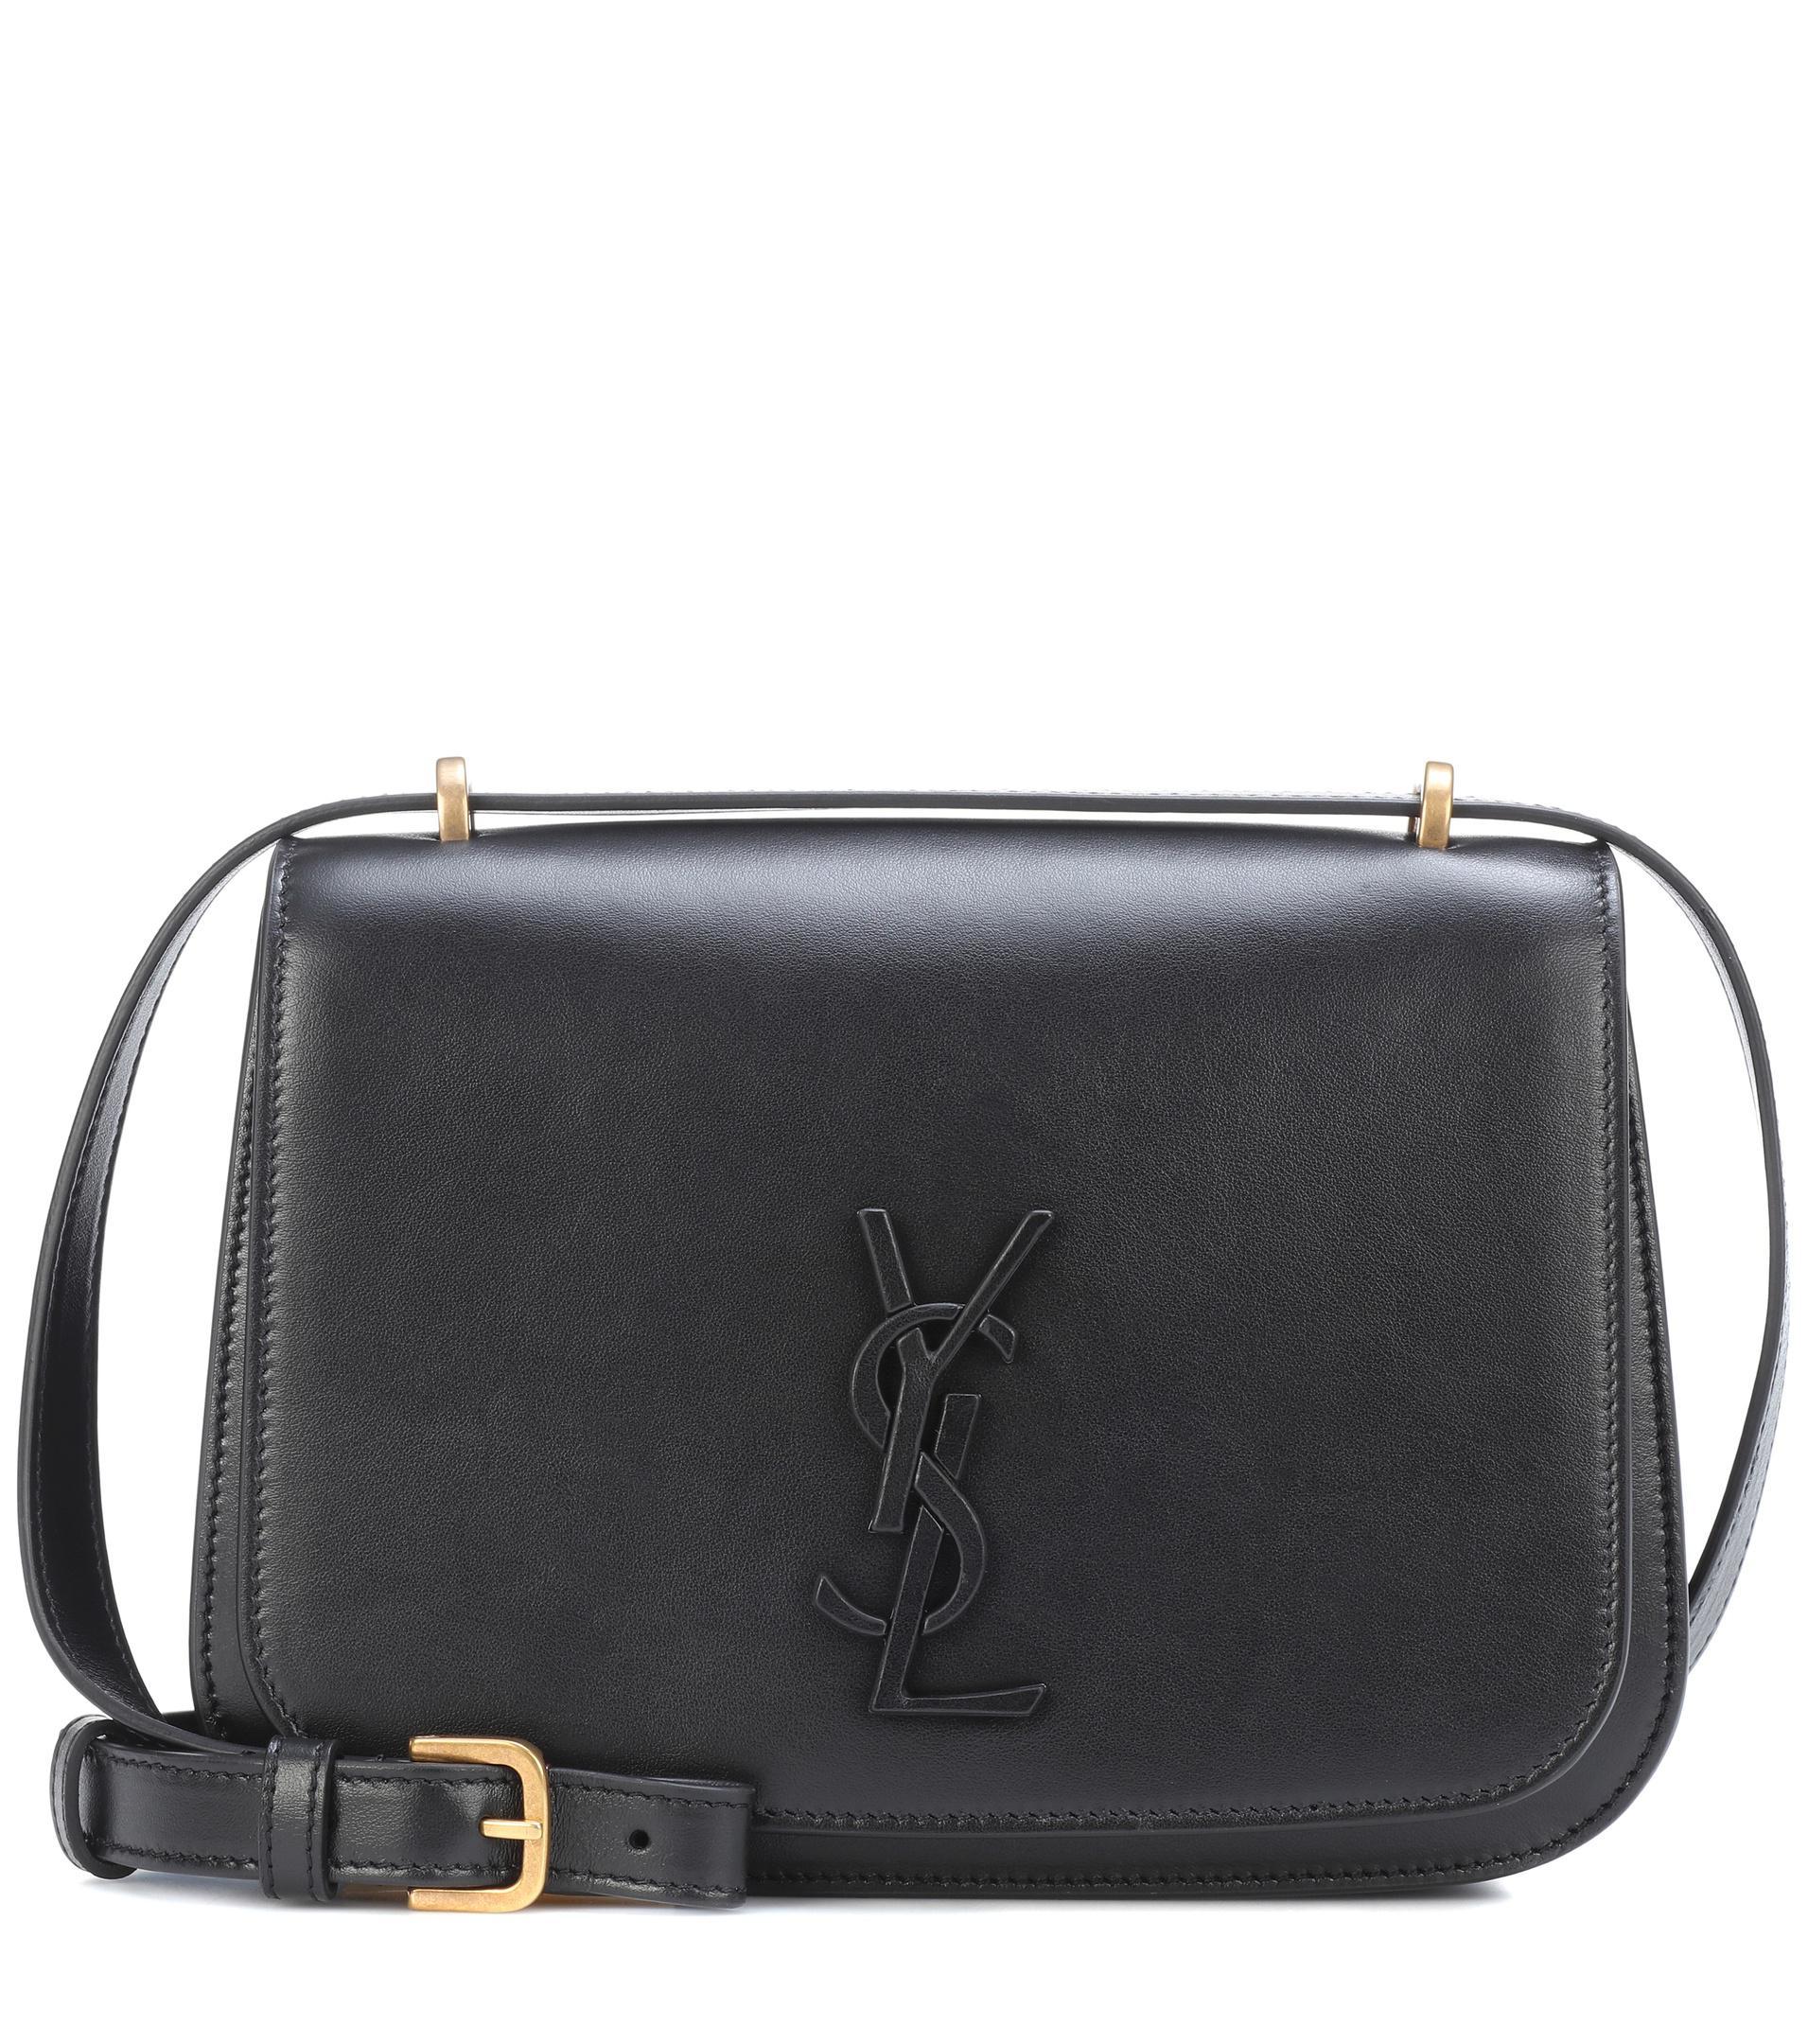 medium Spontini satchel bag - Black Saint Laurent g2J8L